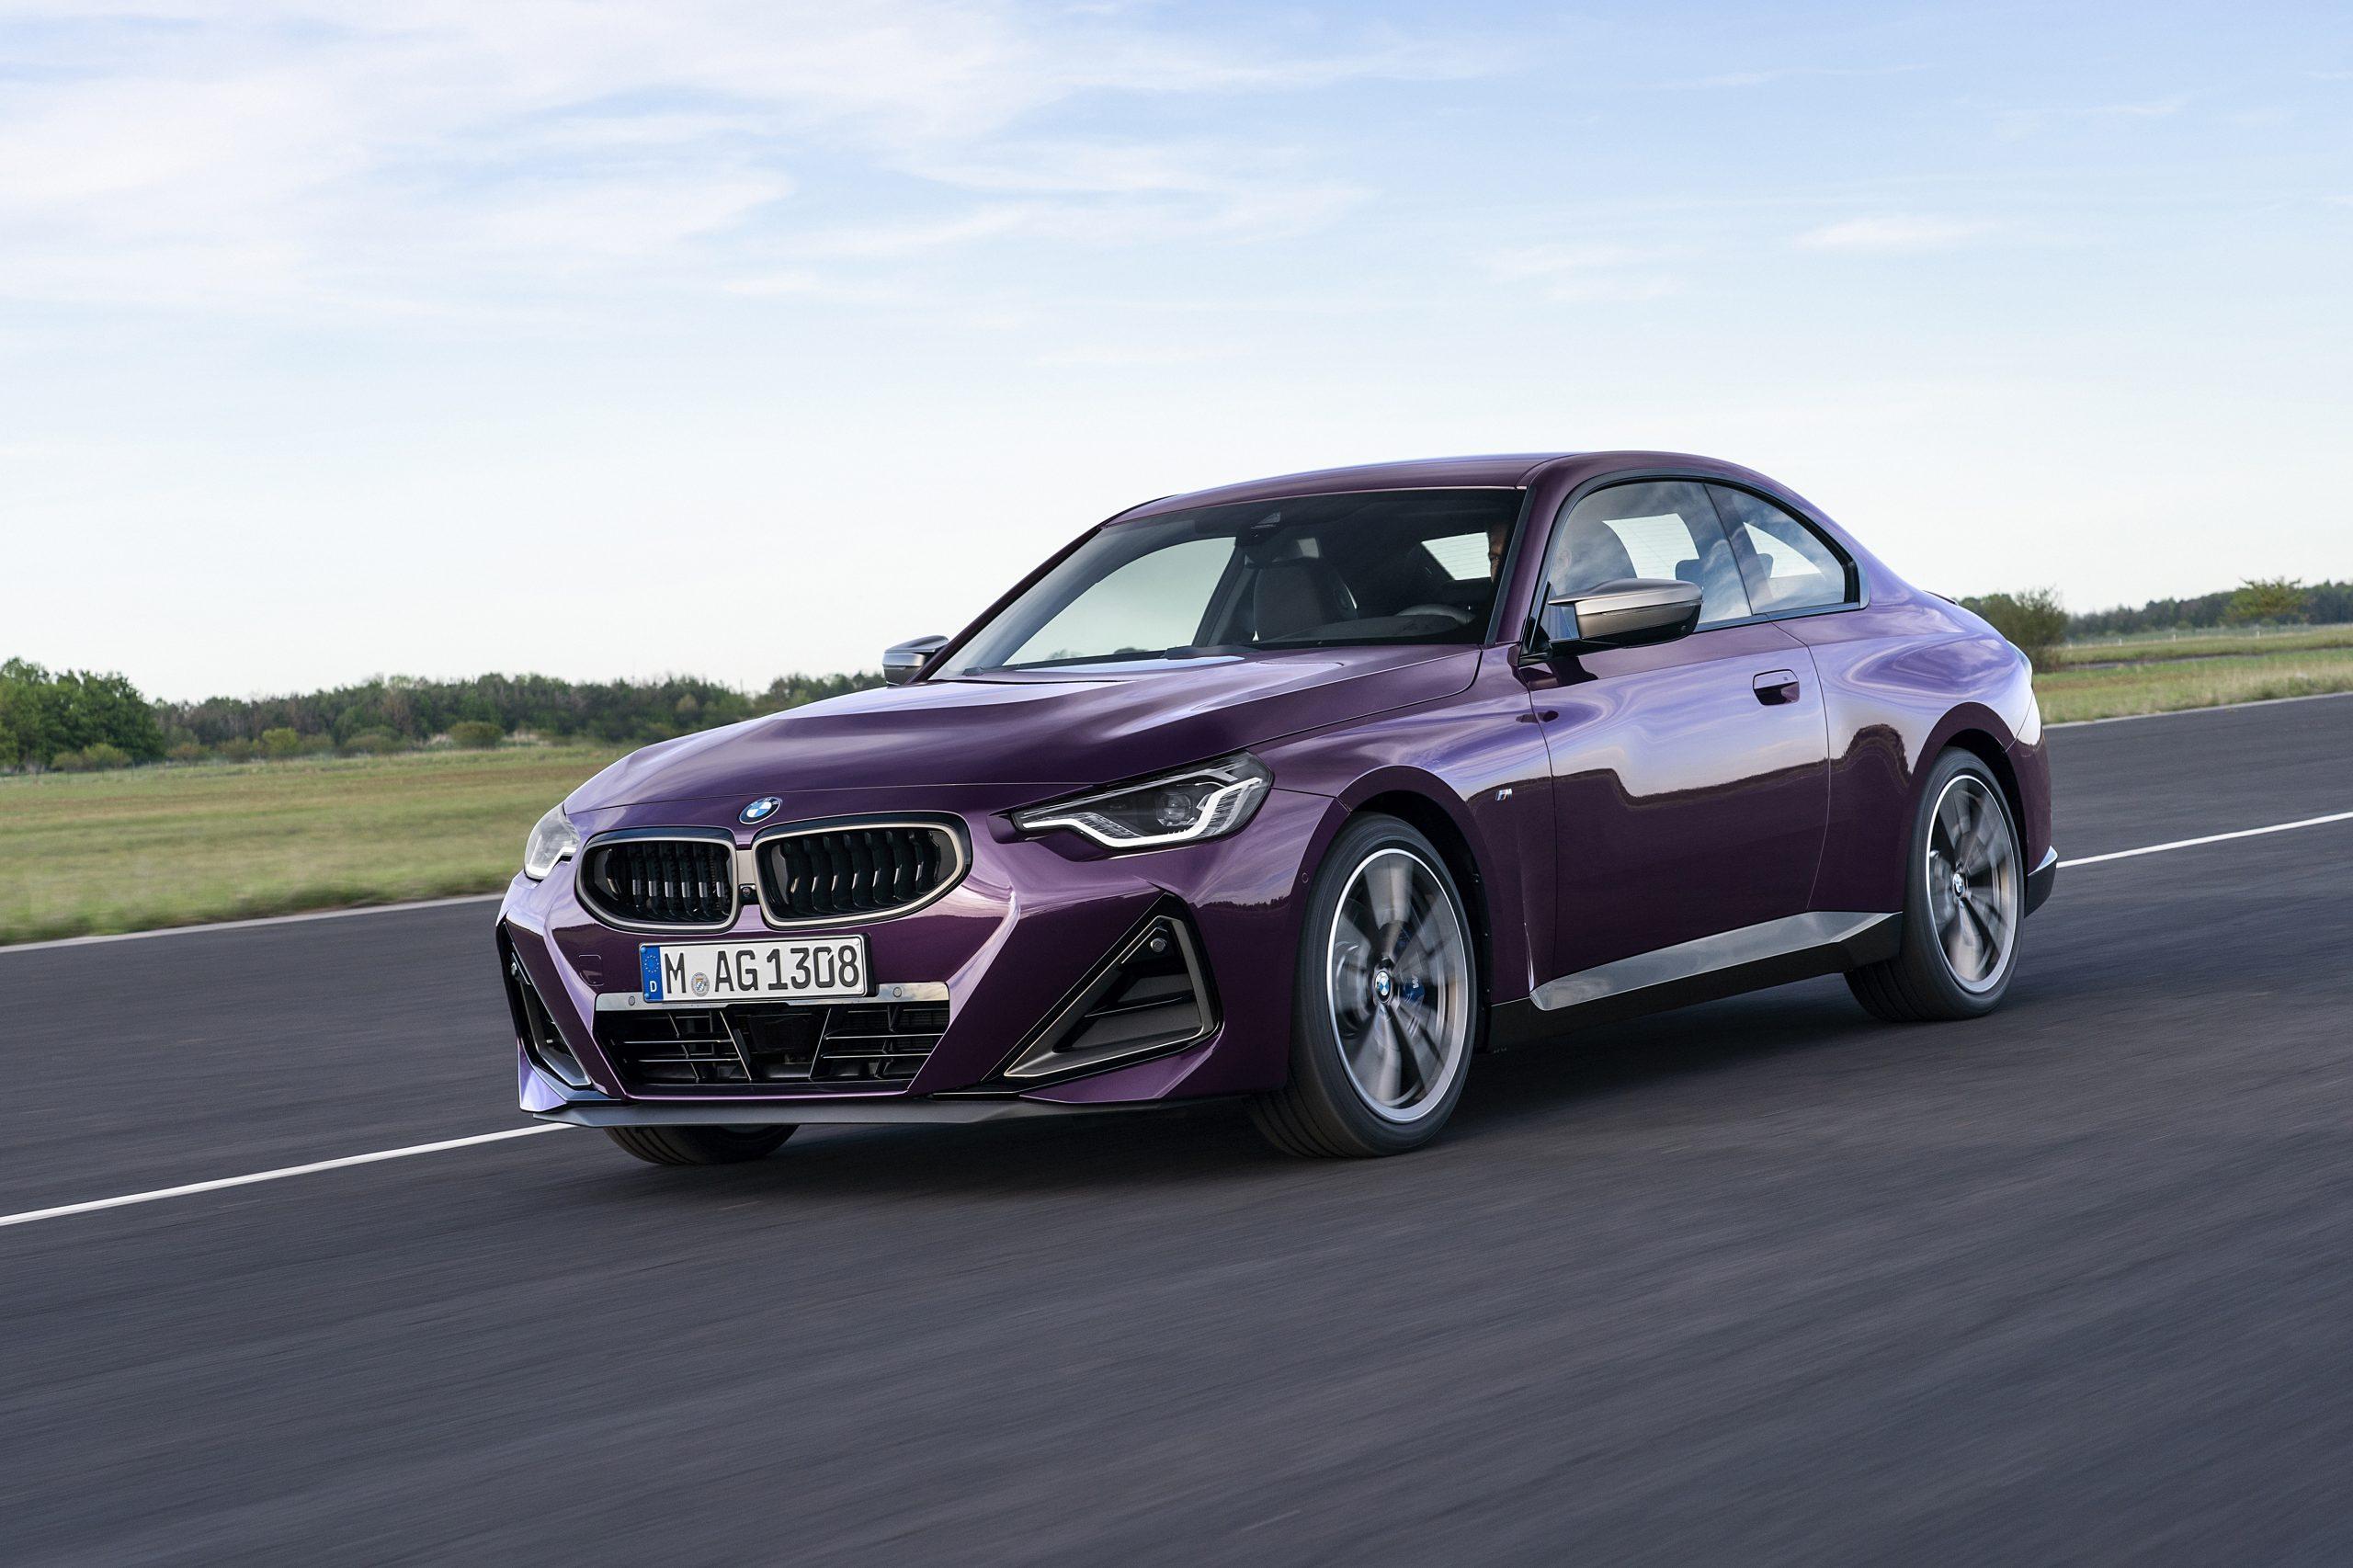 P90428447 highRes scaled Αυτή είναι η νέα BMW Σειρά 2 Coupe BMW, Bmw 2, BMW Σειρά 2, zblog, ειδήσεις, Νέα, Σειρά 2